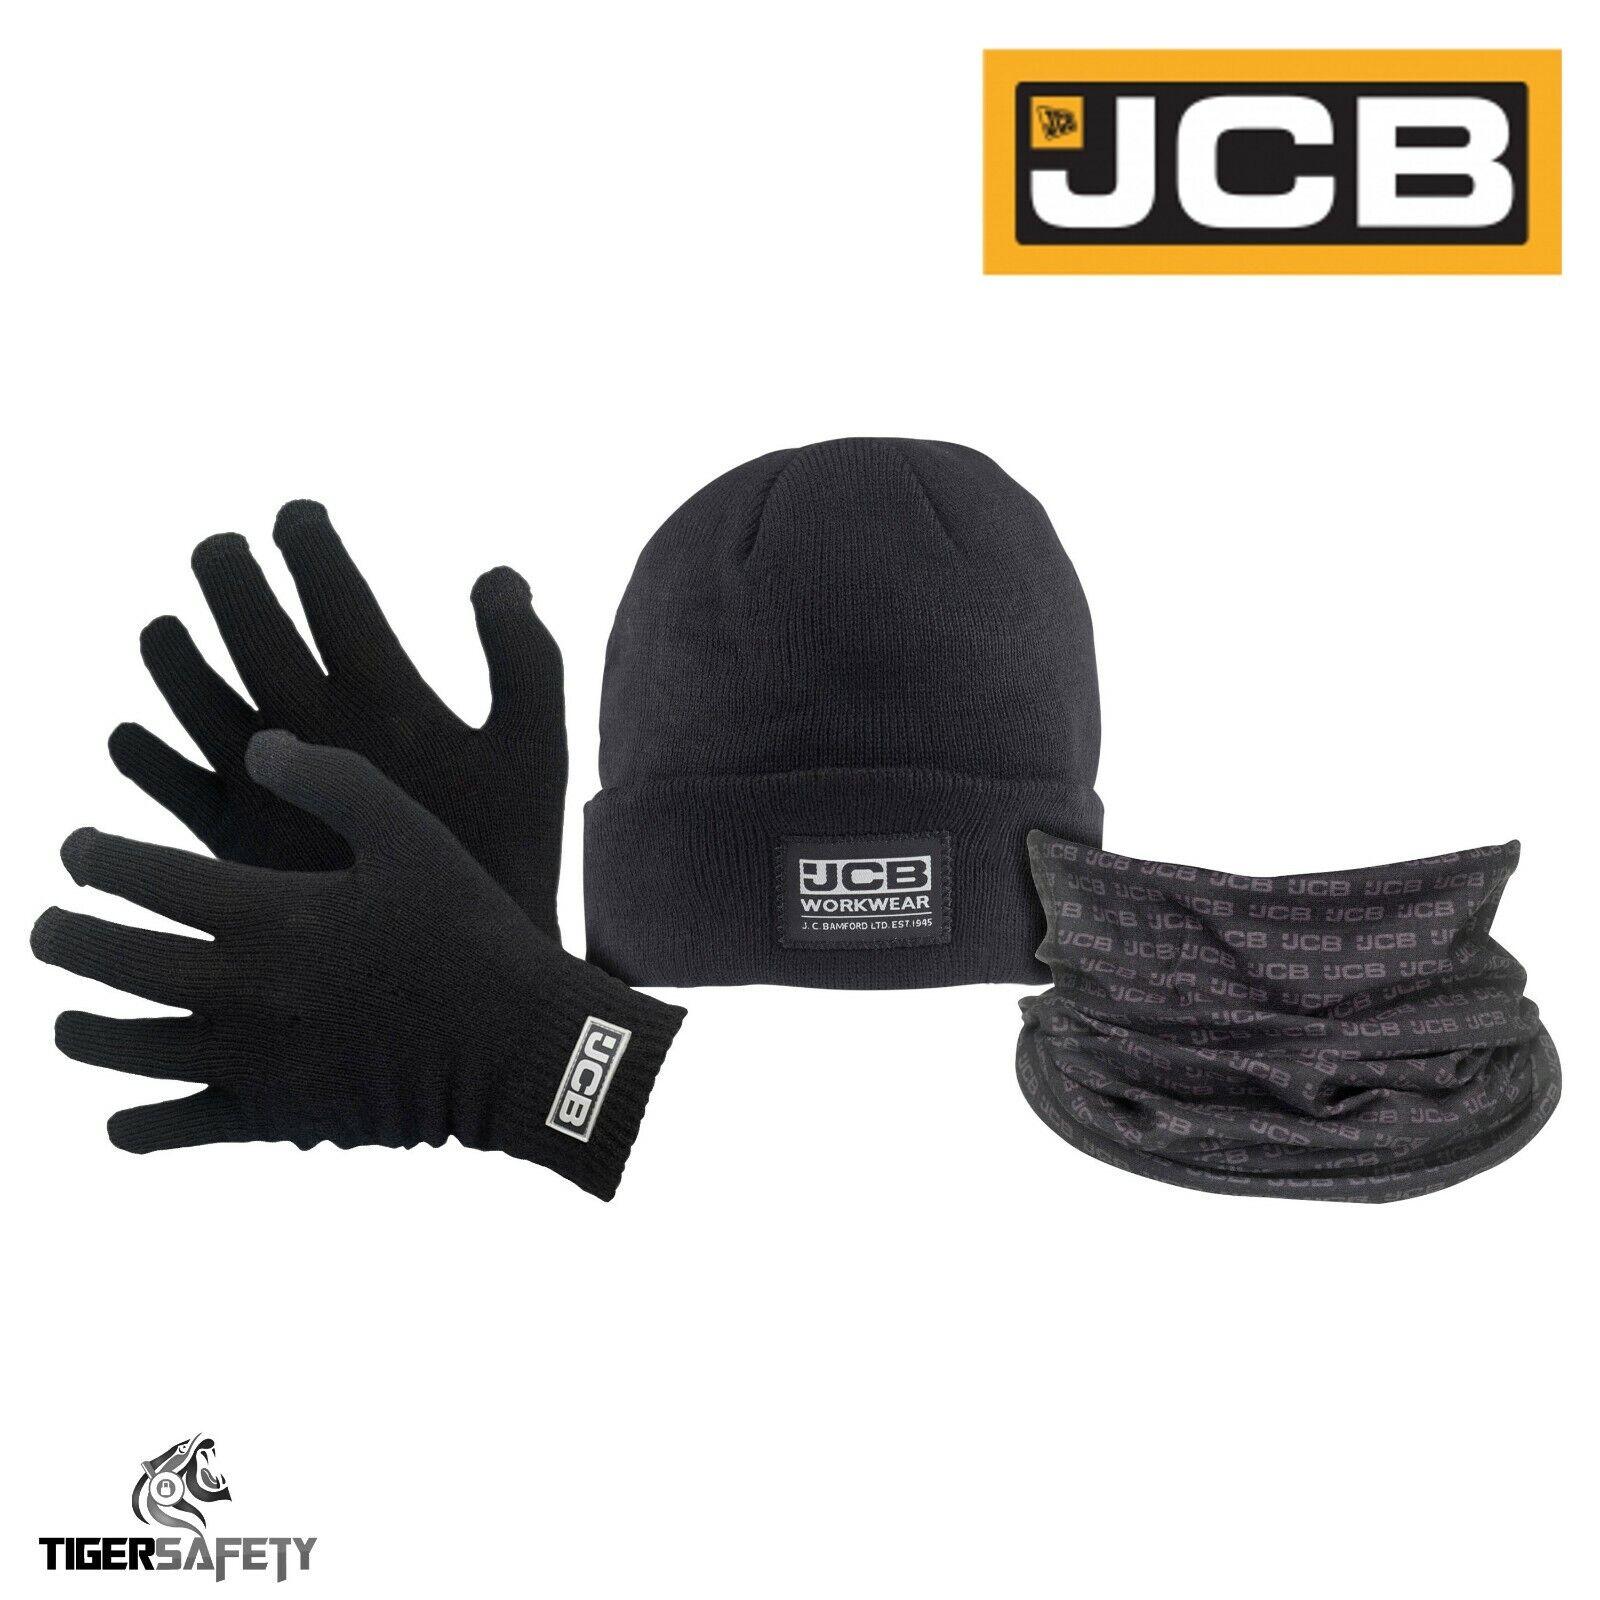 JCB Winter Set Black Thermal Gloves Beanie Hat Snood Scarf Christmas Gift set